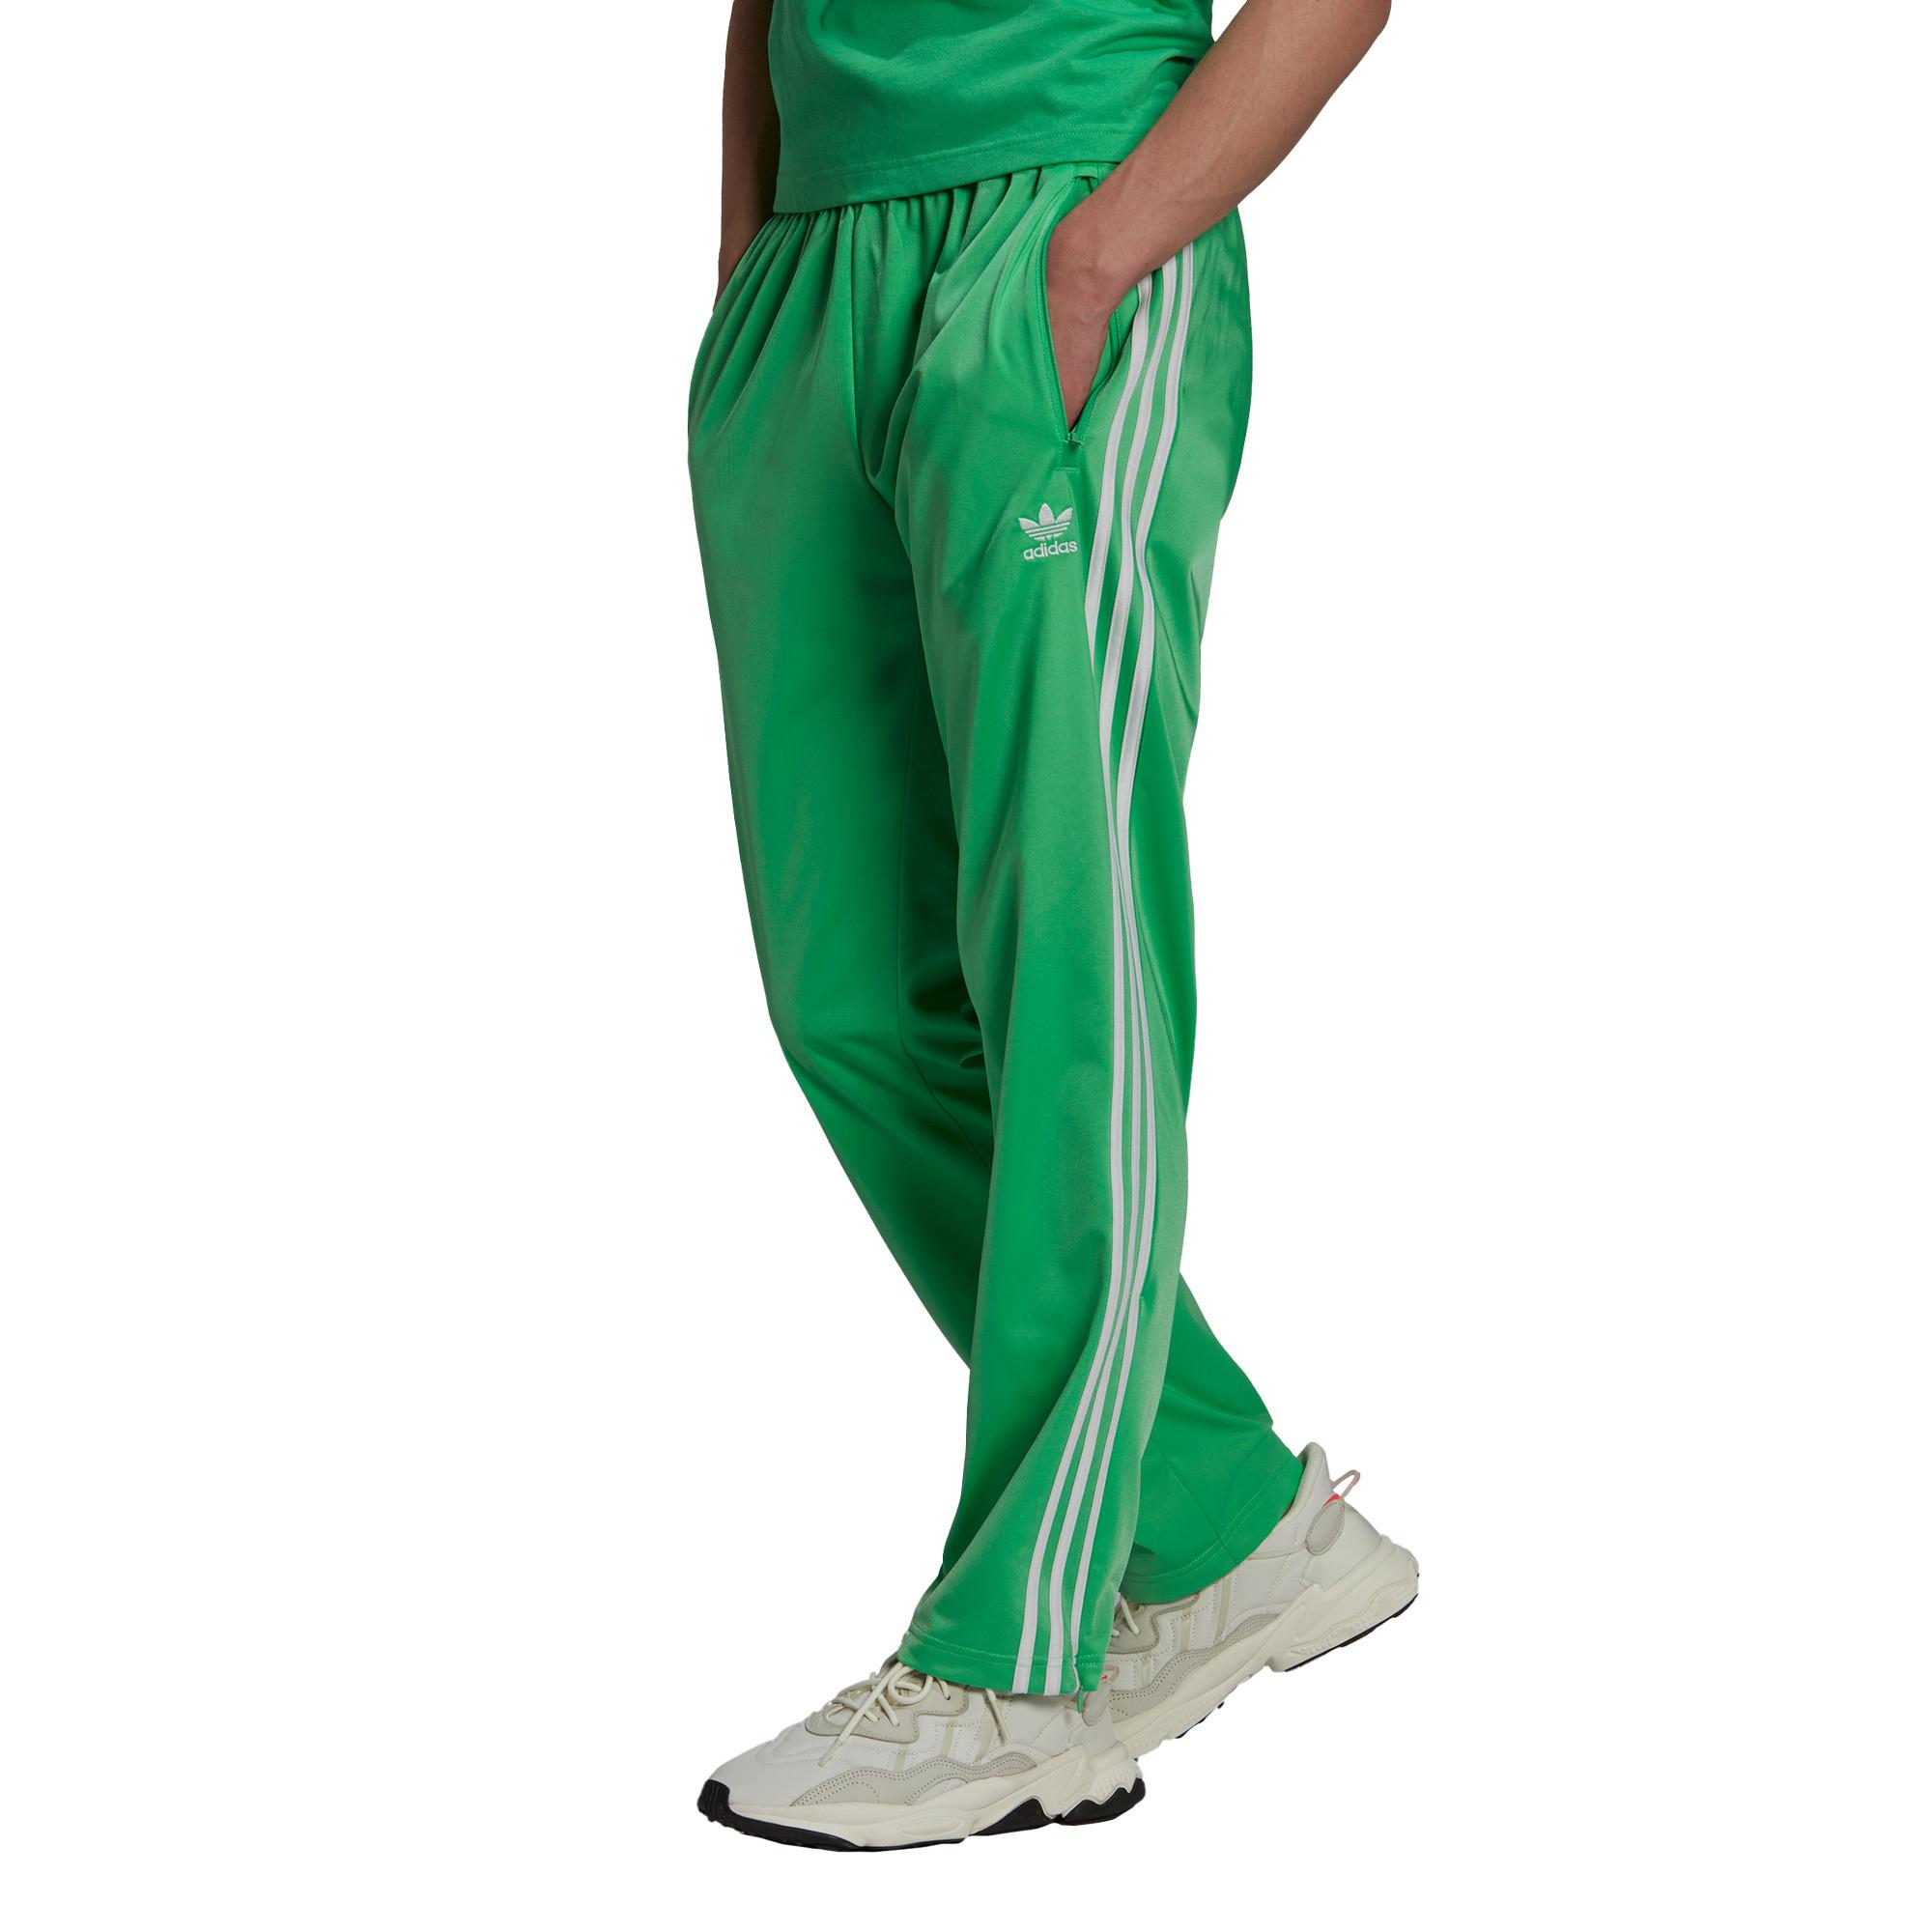 Pantaloni tuta uomo adicolor Classics Firebird Primeblue, Verde, large image number 0